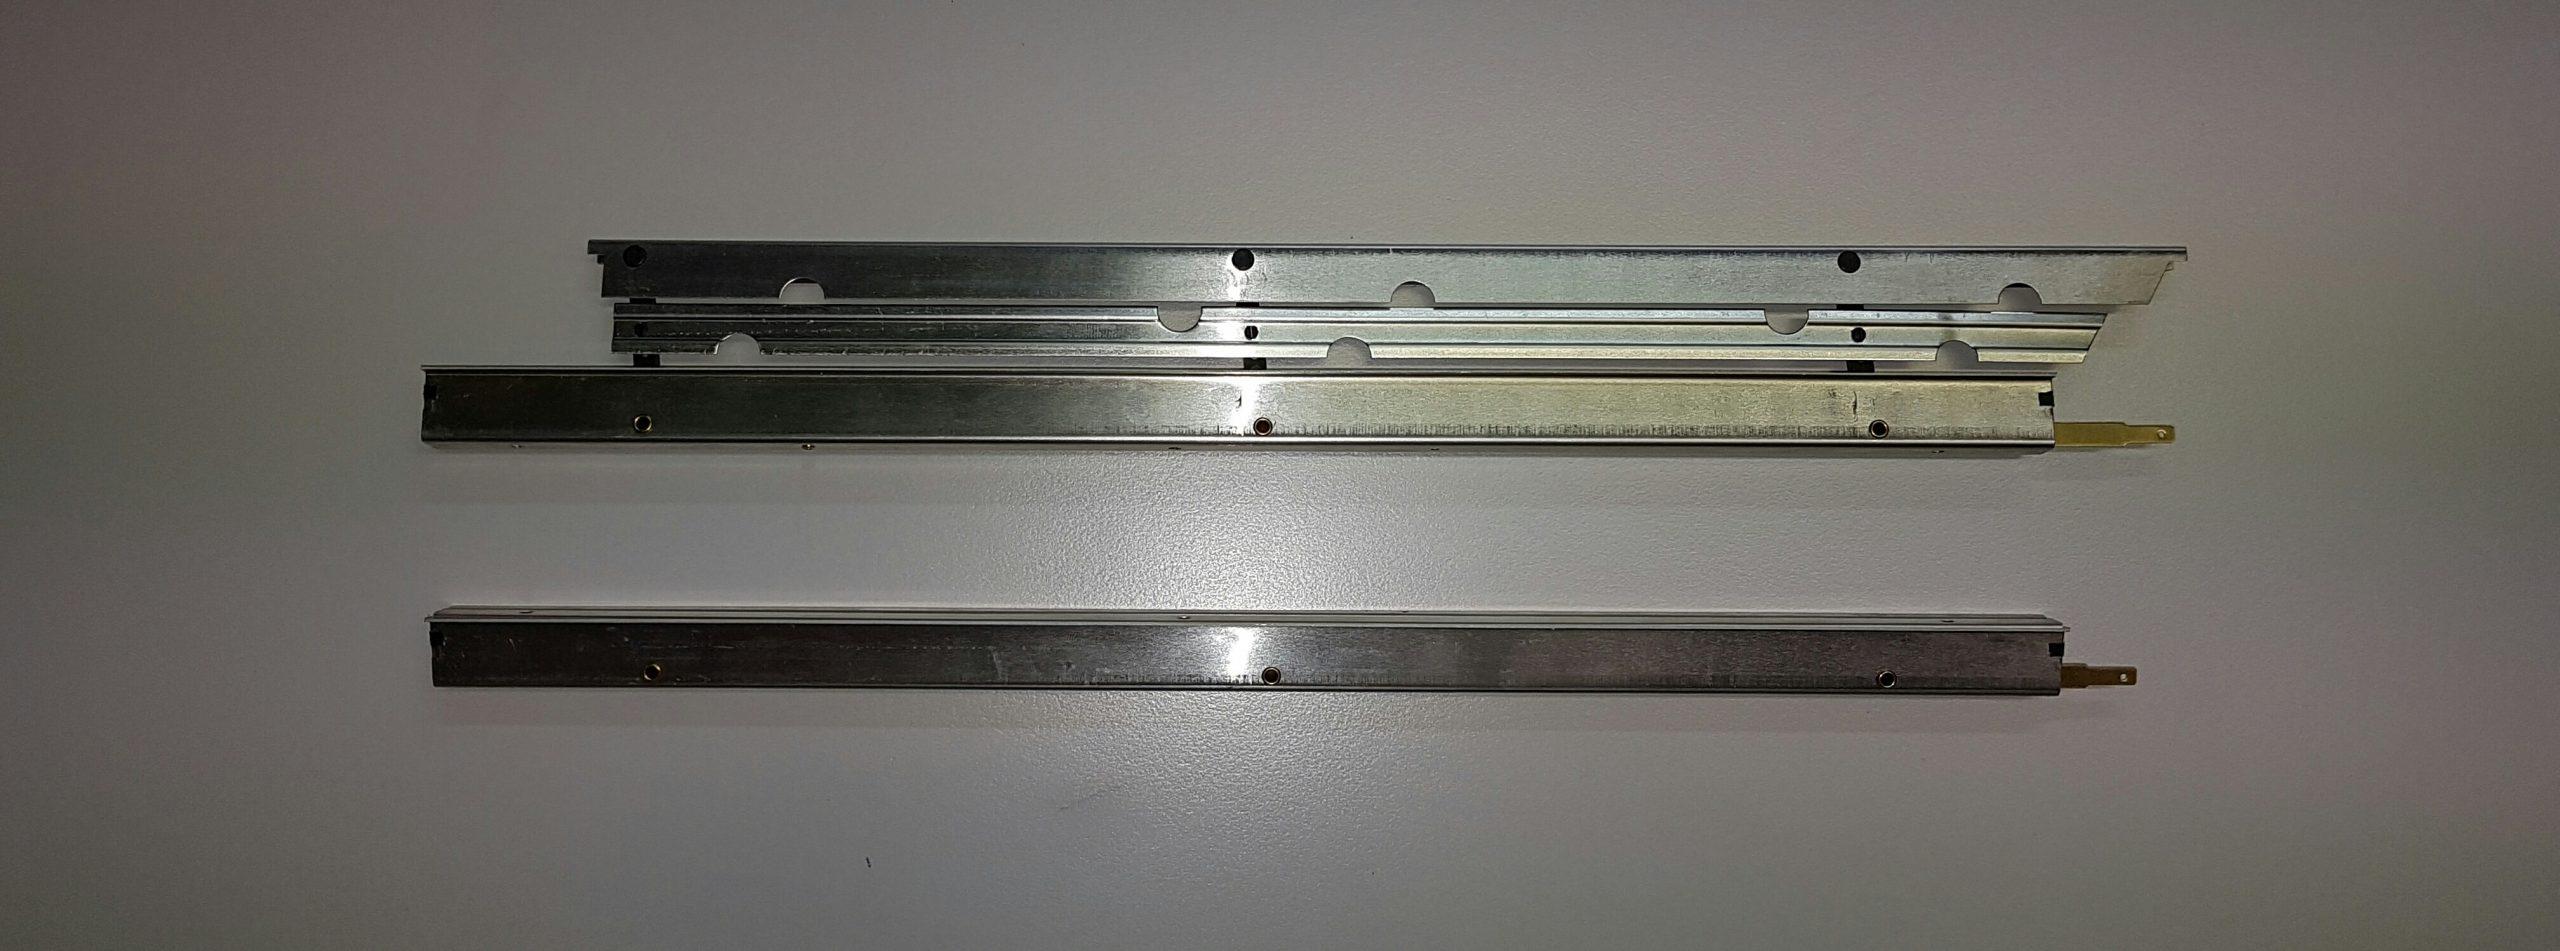 Aérofreins Fingerle 370/16 mm, einfach/silber